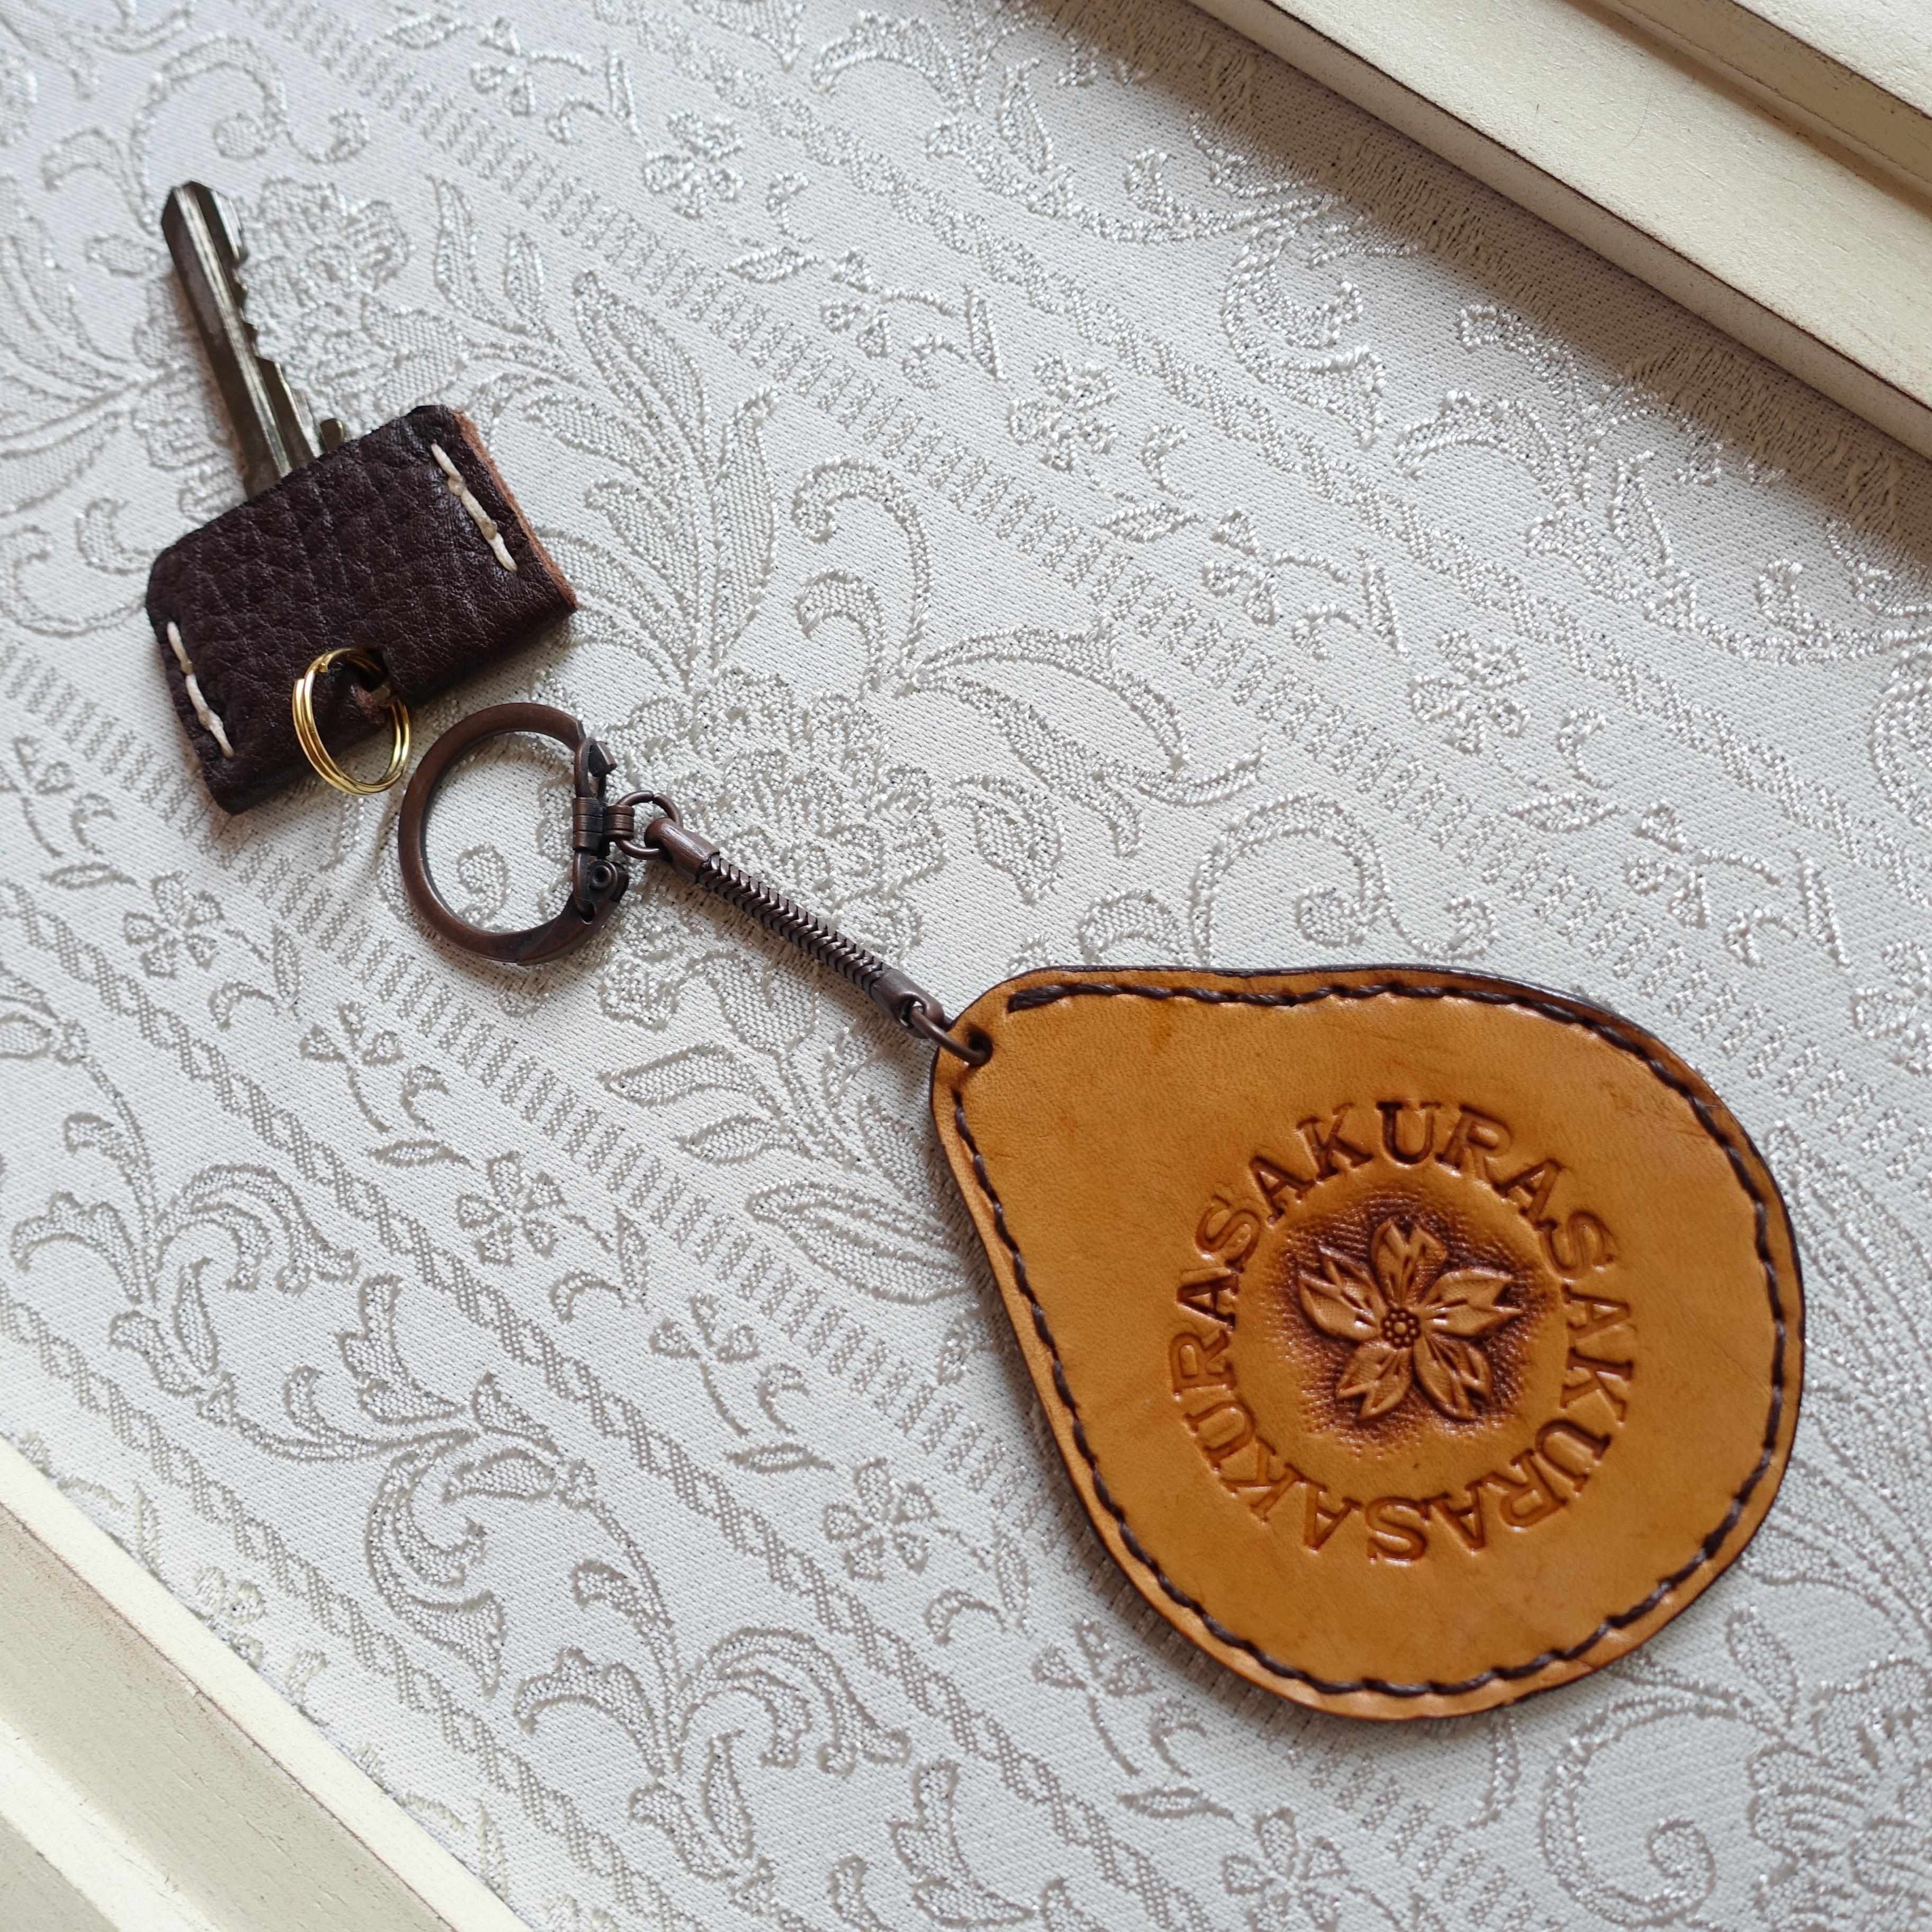 SALE! 革好きさんのためのカービングのキーホルダー/さくらA(送料無料)